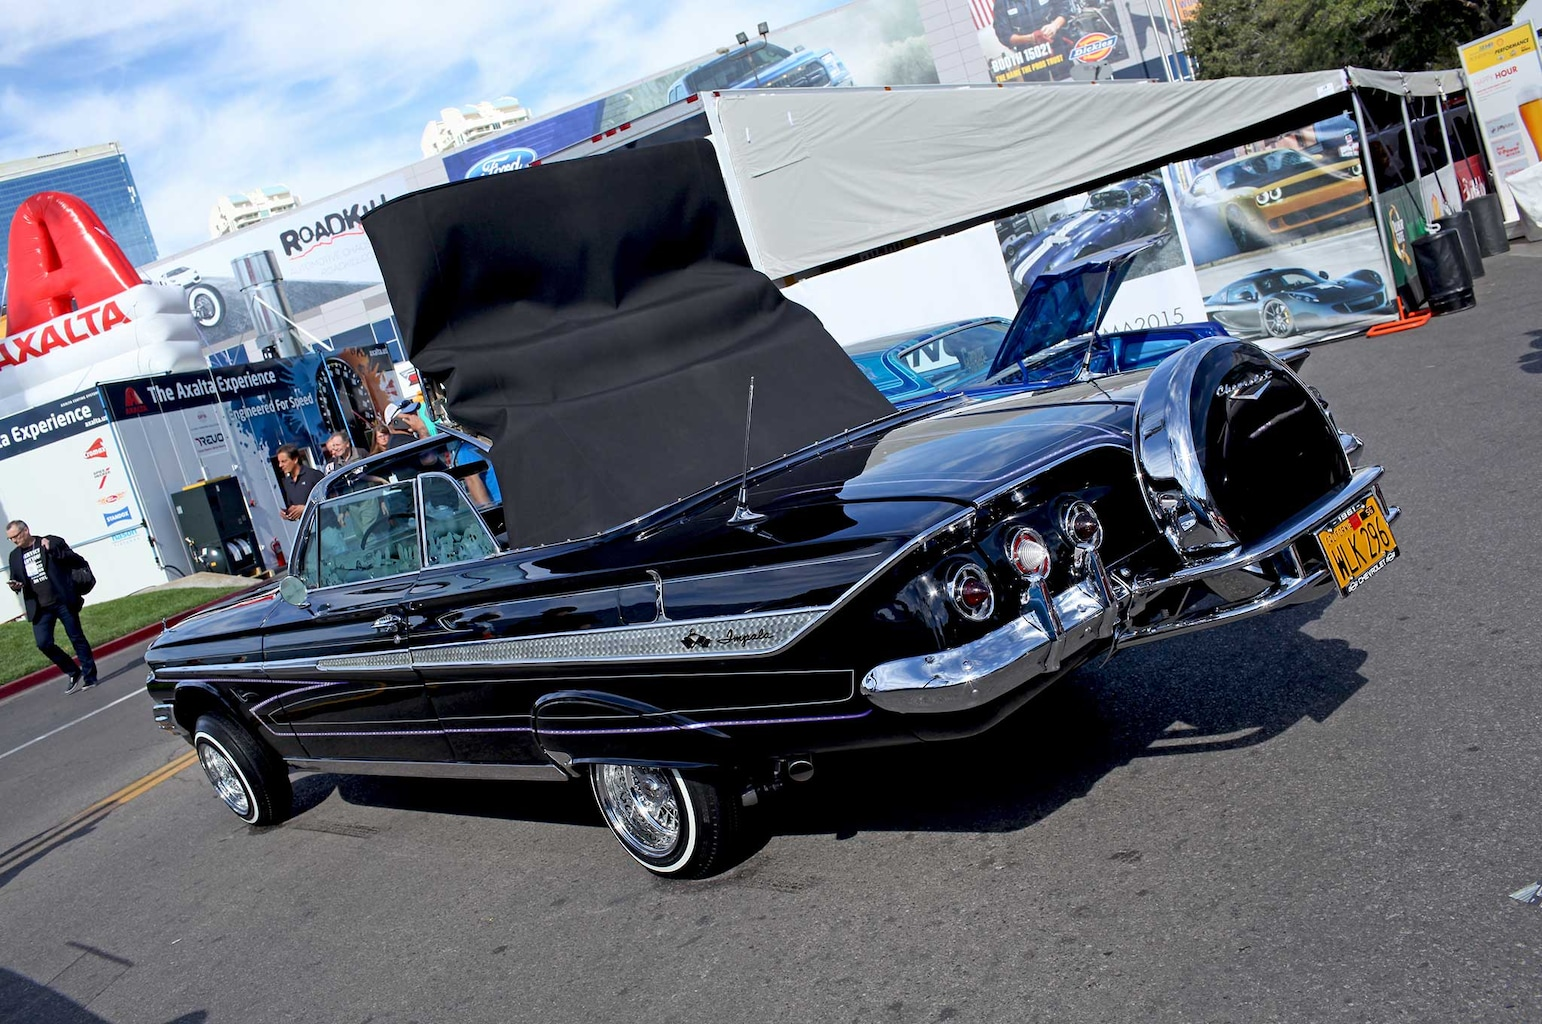 012 lowriders at sema 2015 lorenzo rodriguez 61 impala convertible